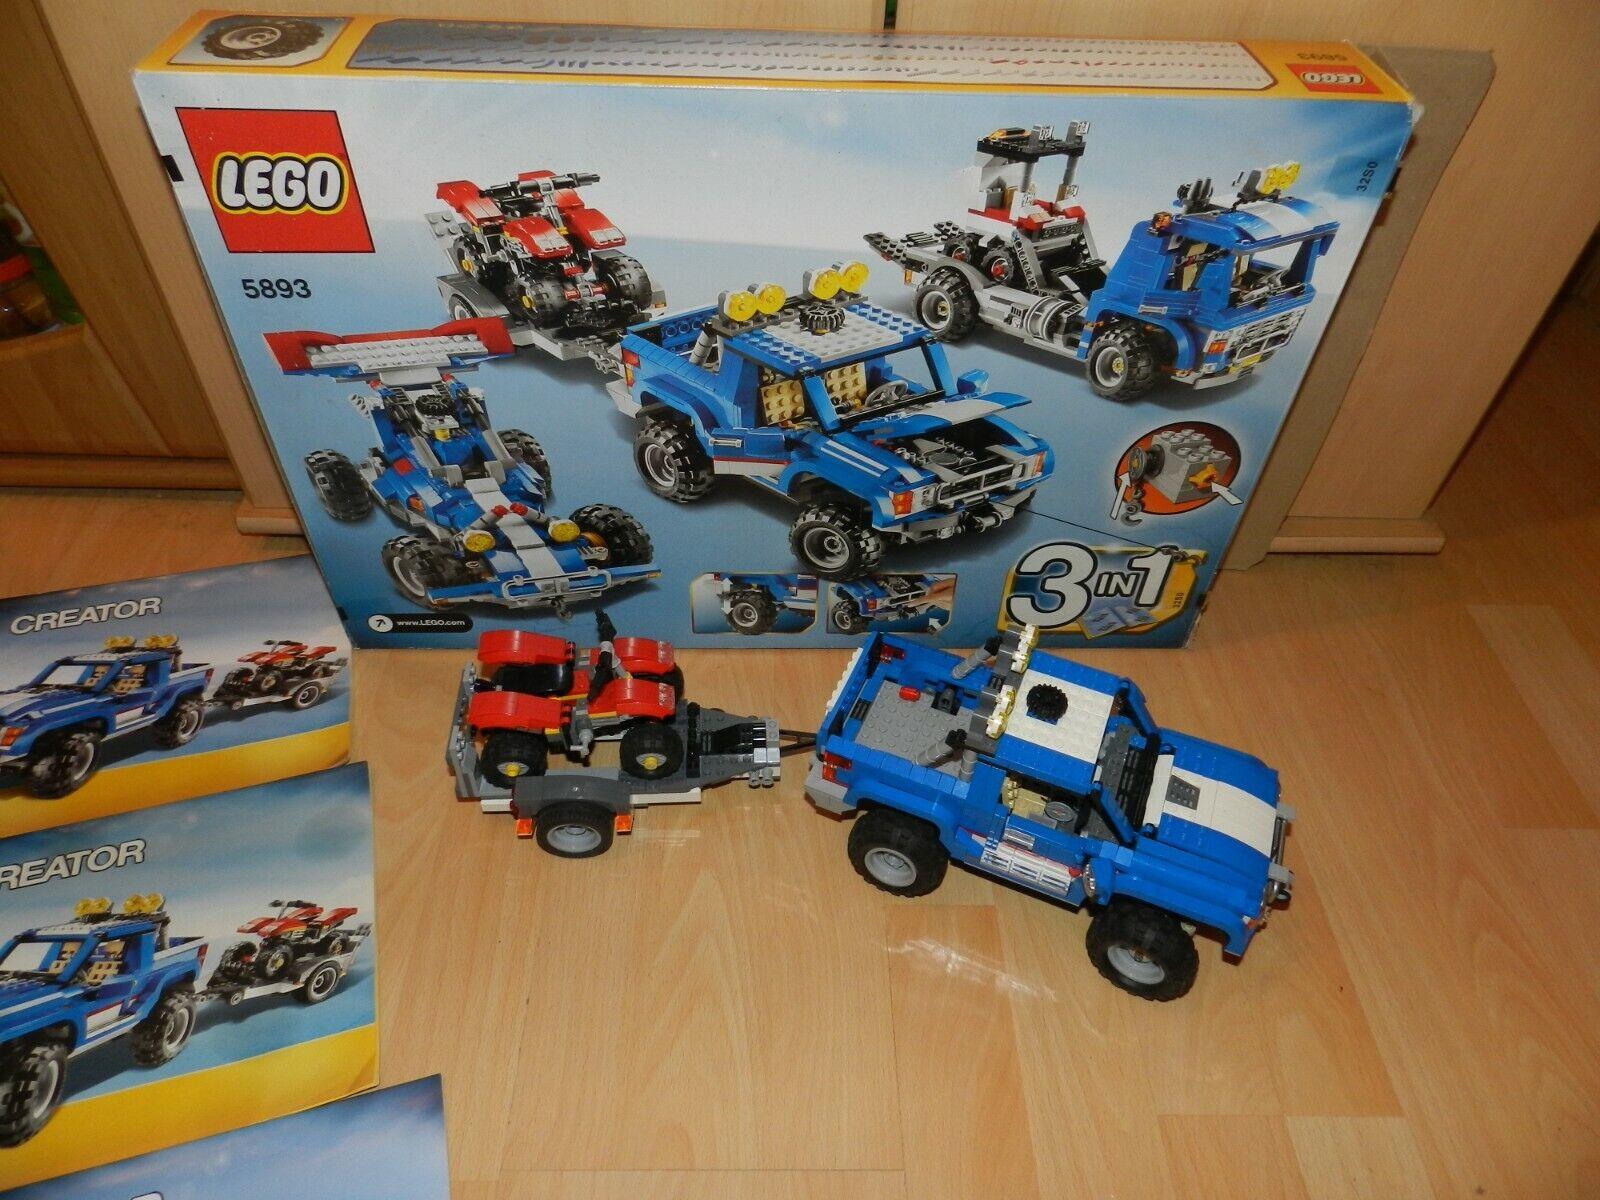 Lego 5893 Creator, jeep avec quad, 100% complet, 3 in 1,mit recettes, NEUF dans sa boîte